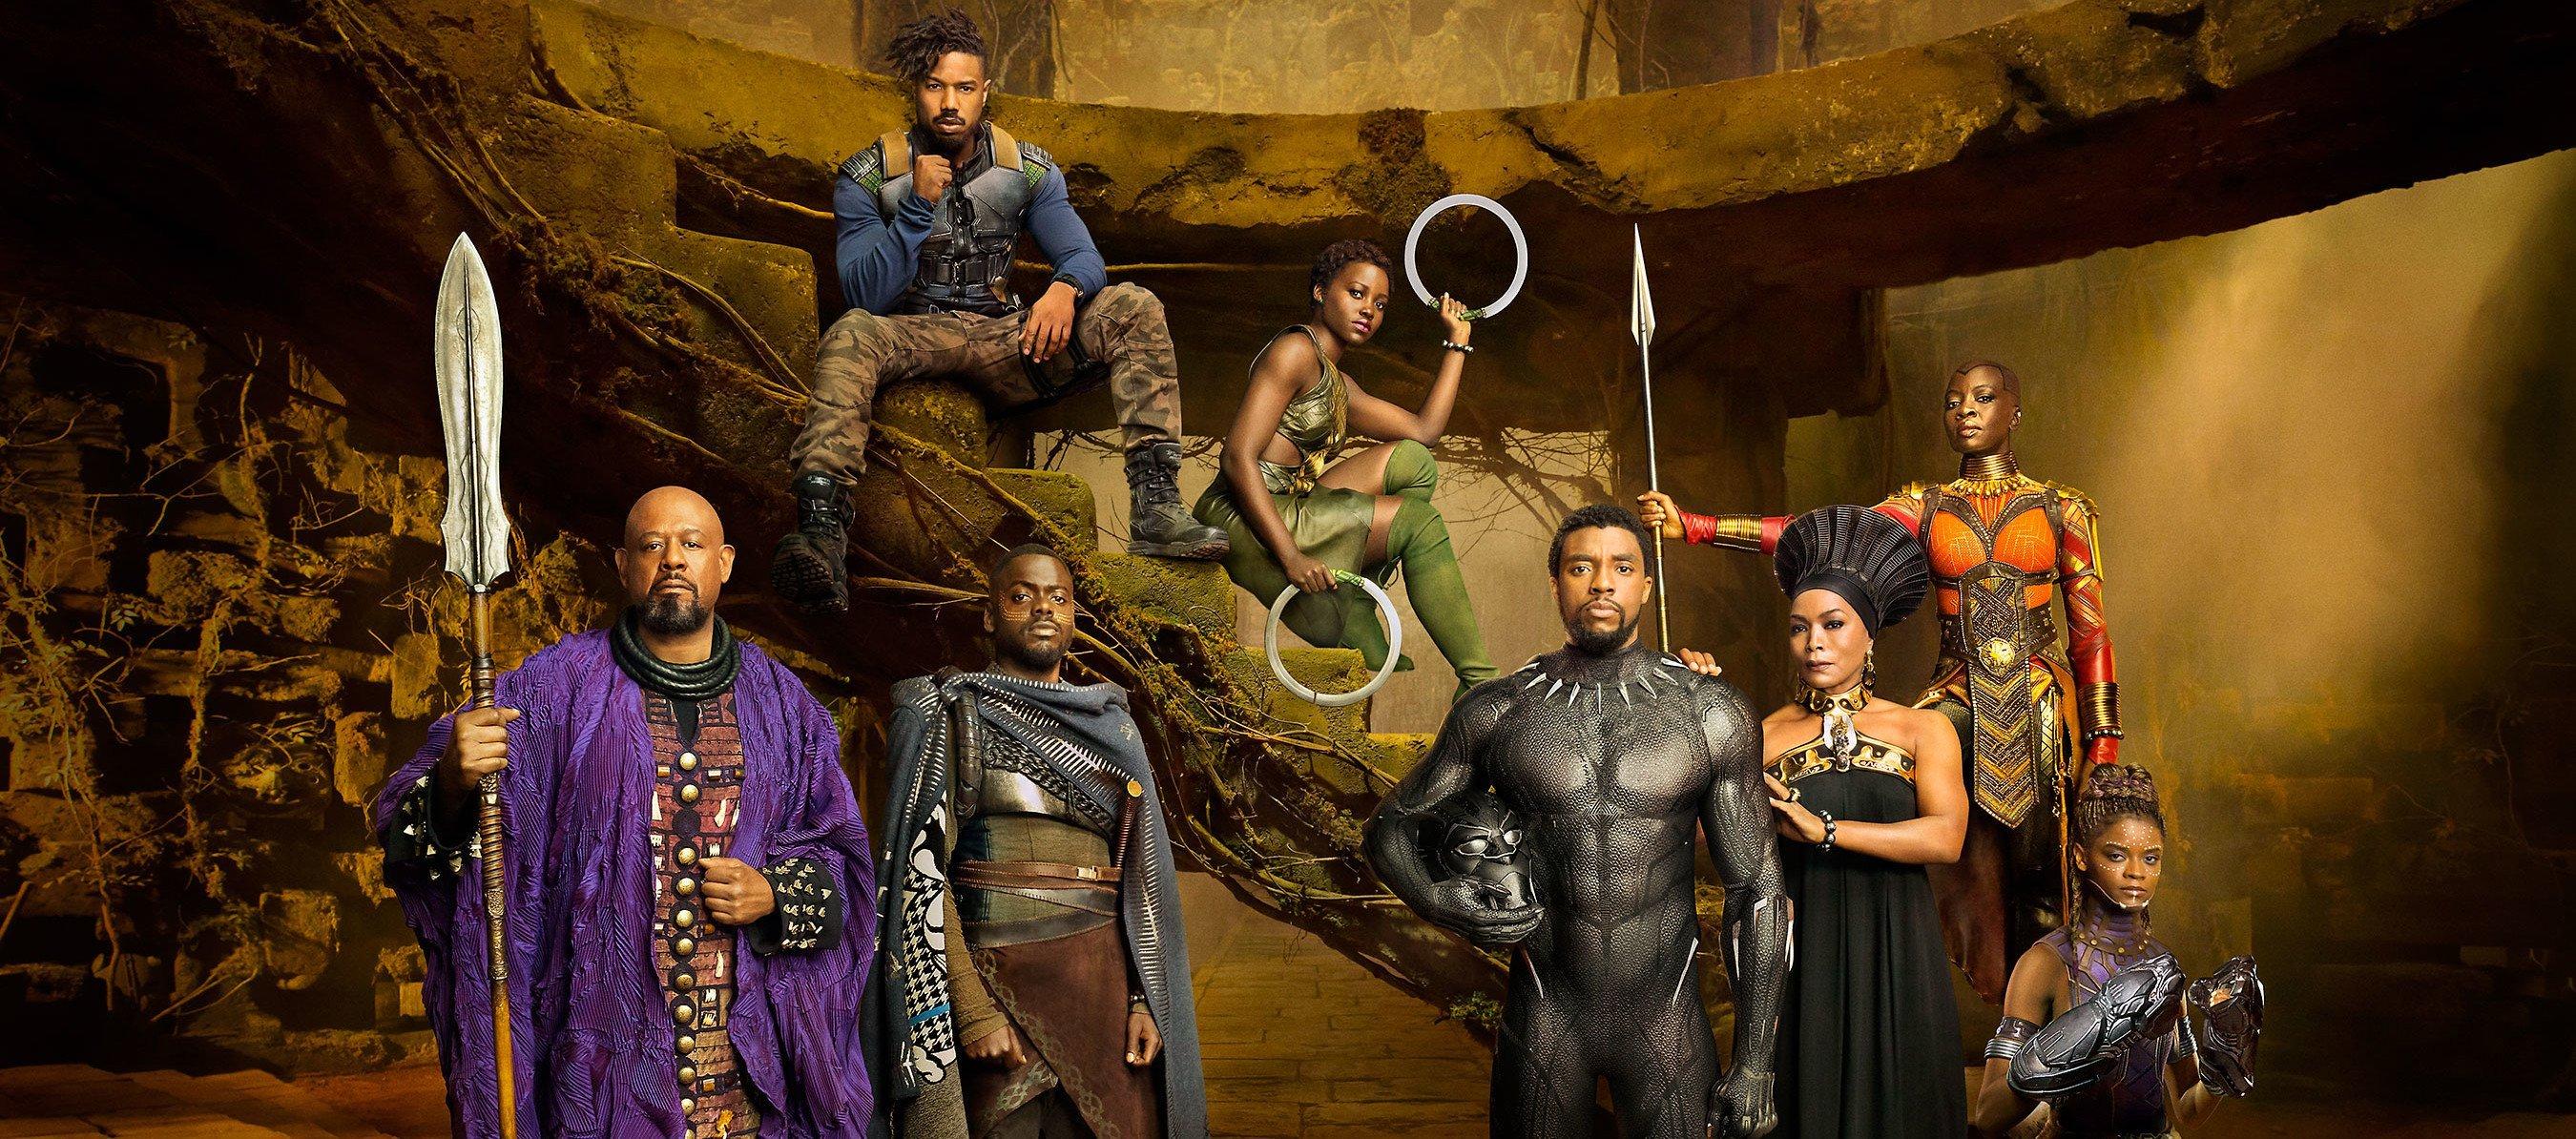 Black Panther, Marvel, Cast, T'Challa